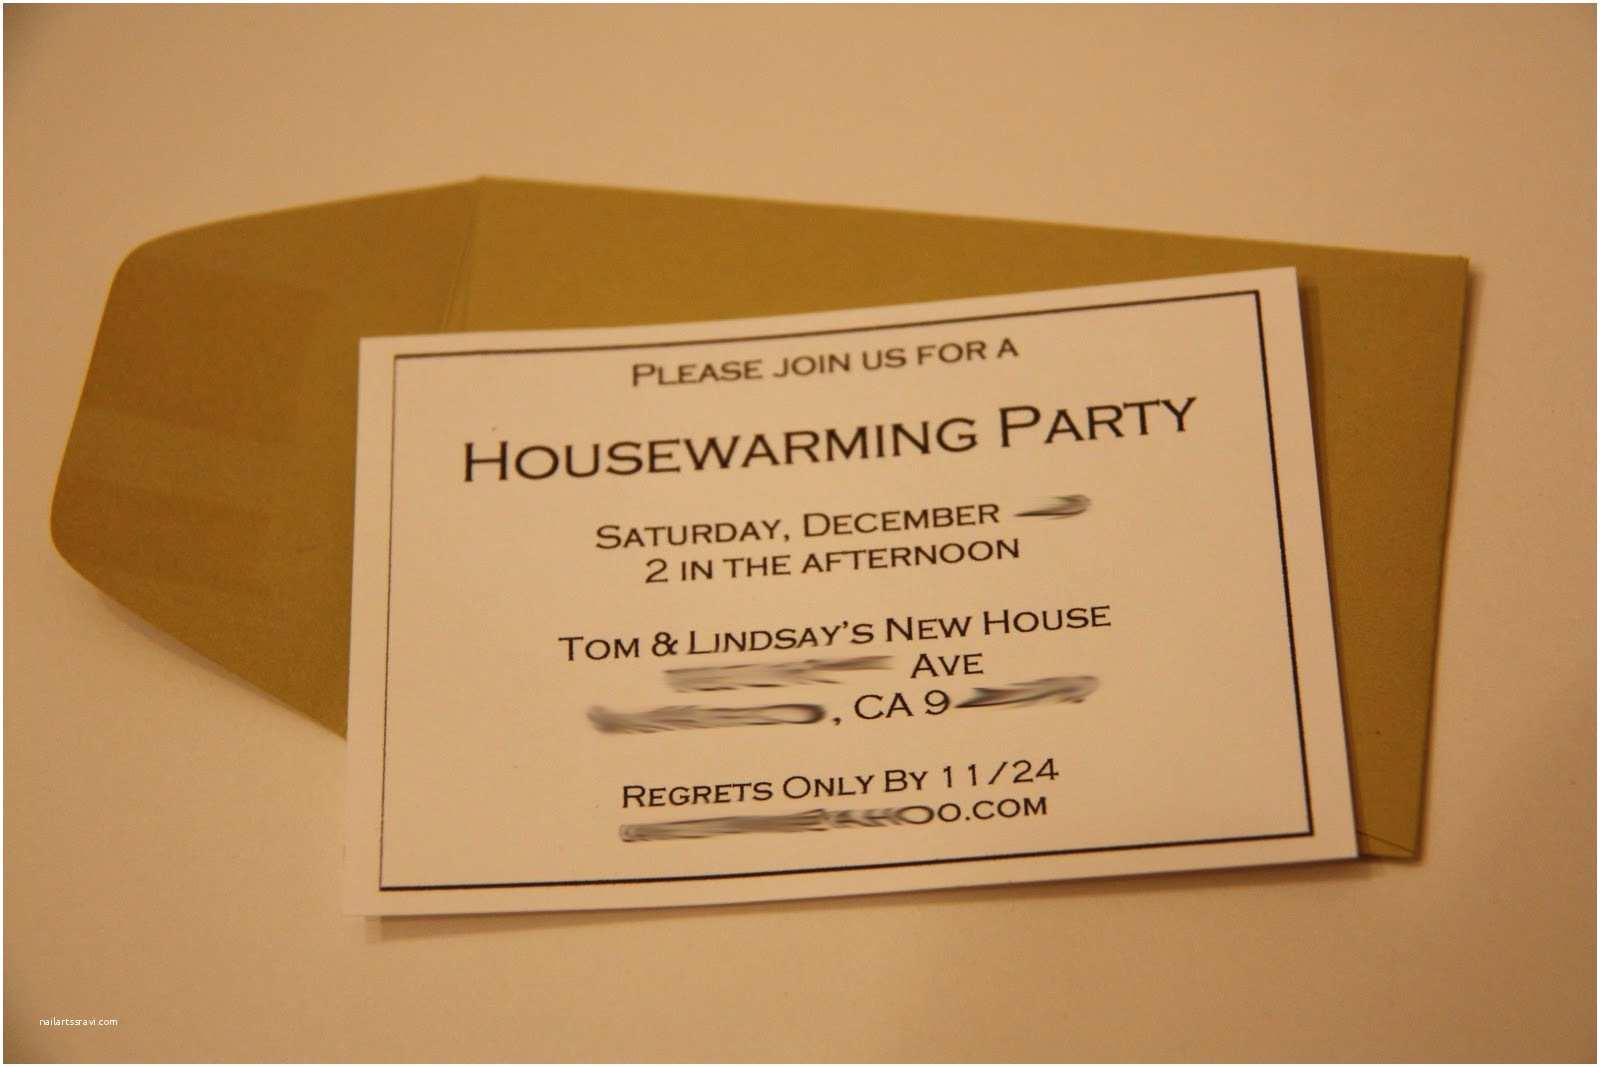 Housewarming Party Invitation Housewarming Party Invitation –